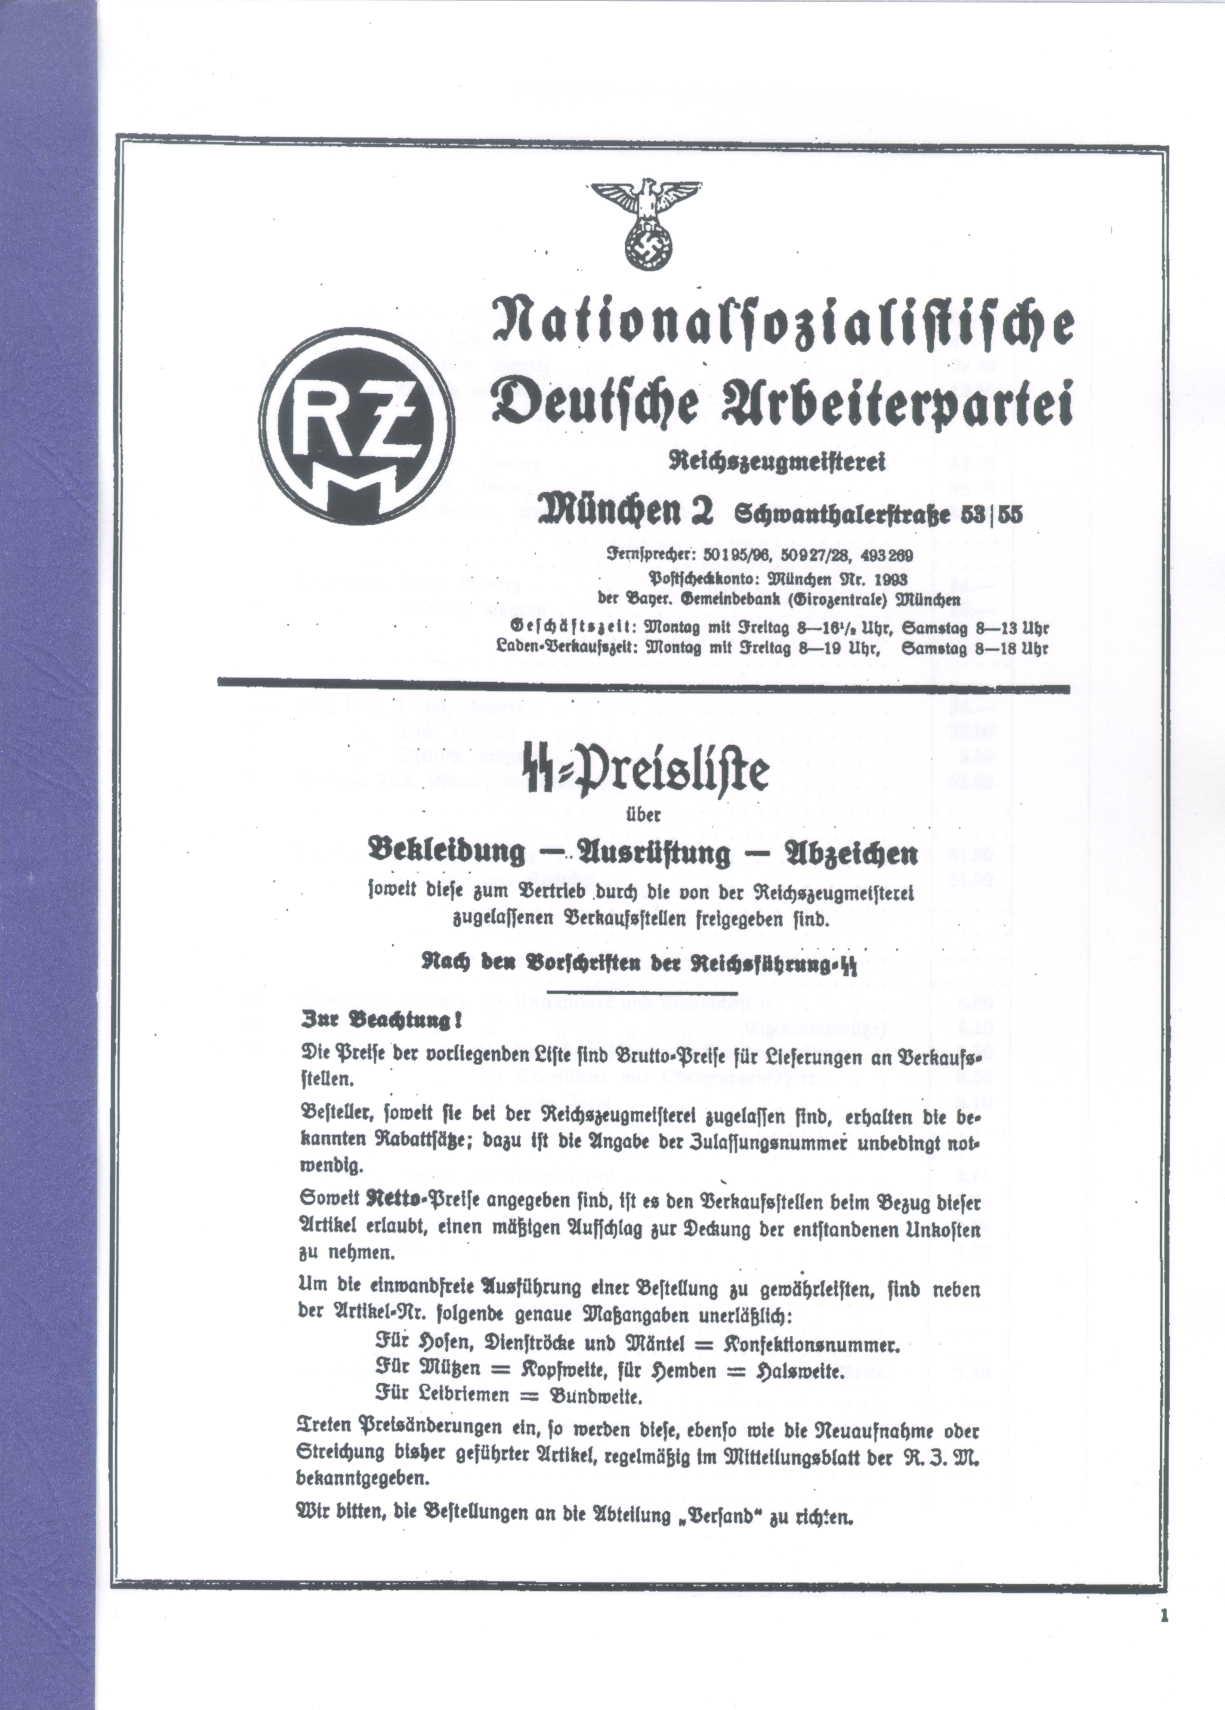 SS-Preisliste der RZM = Reichszeugmeisterei